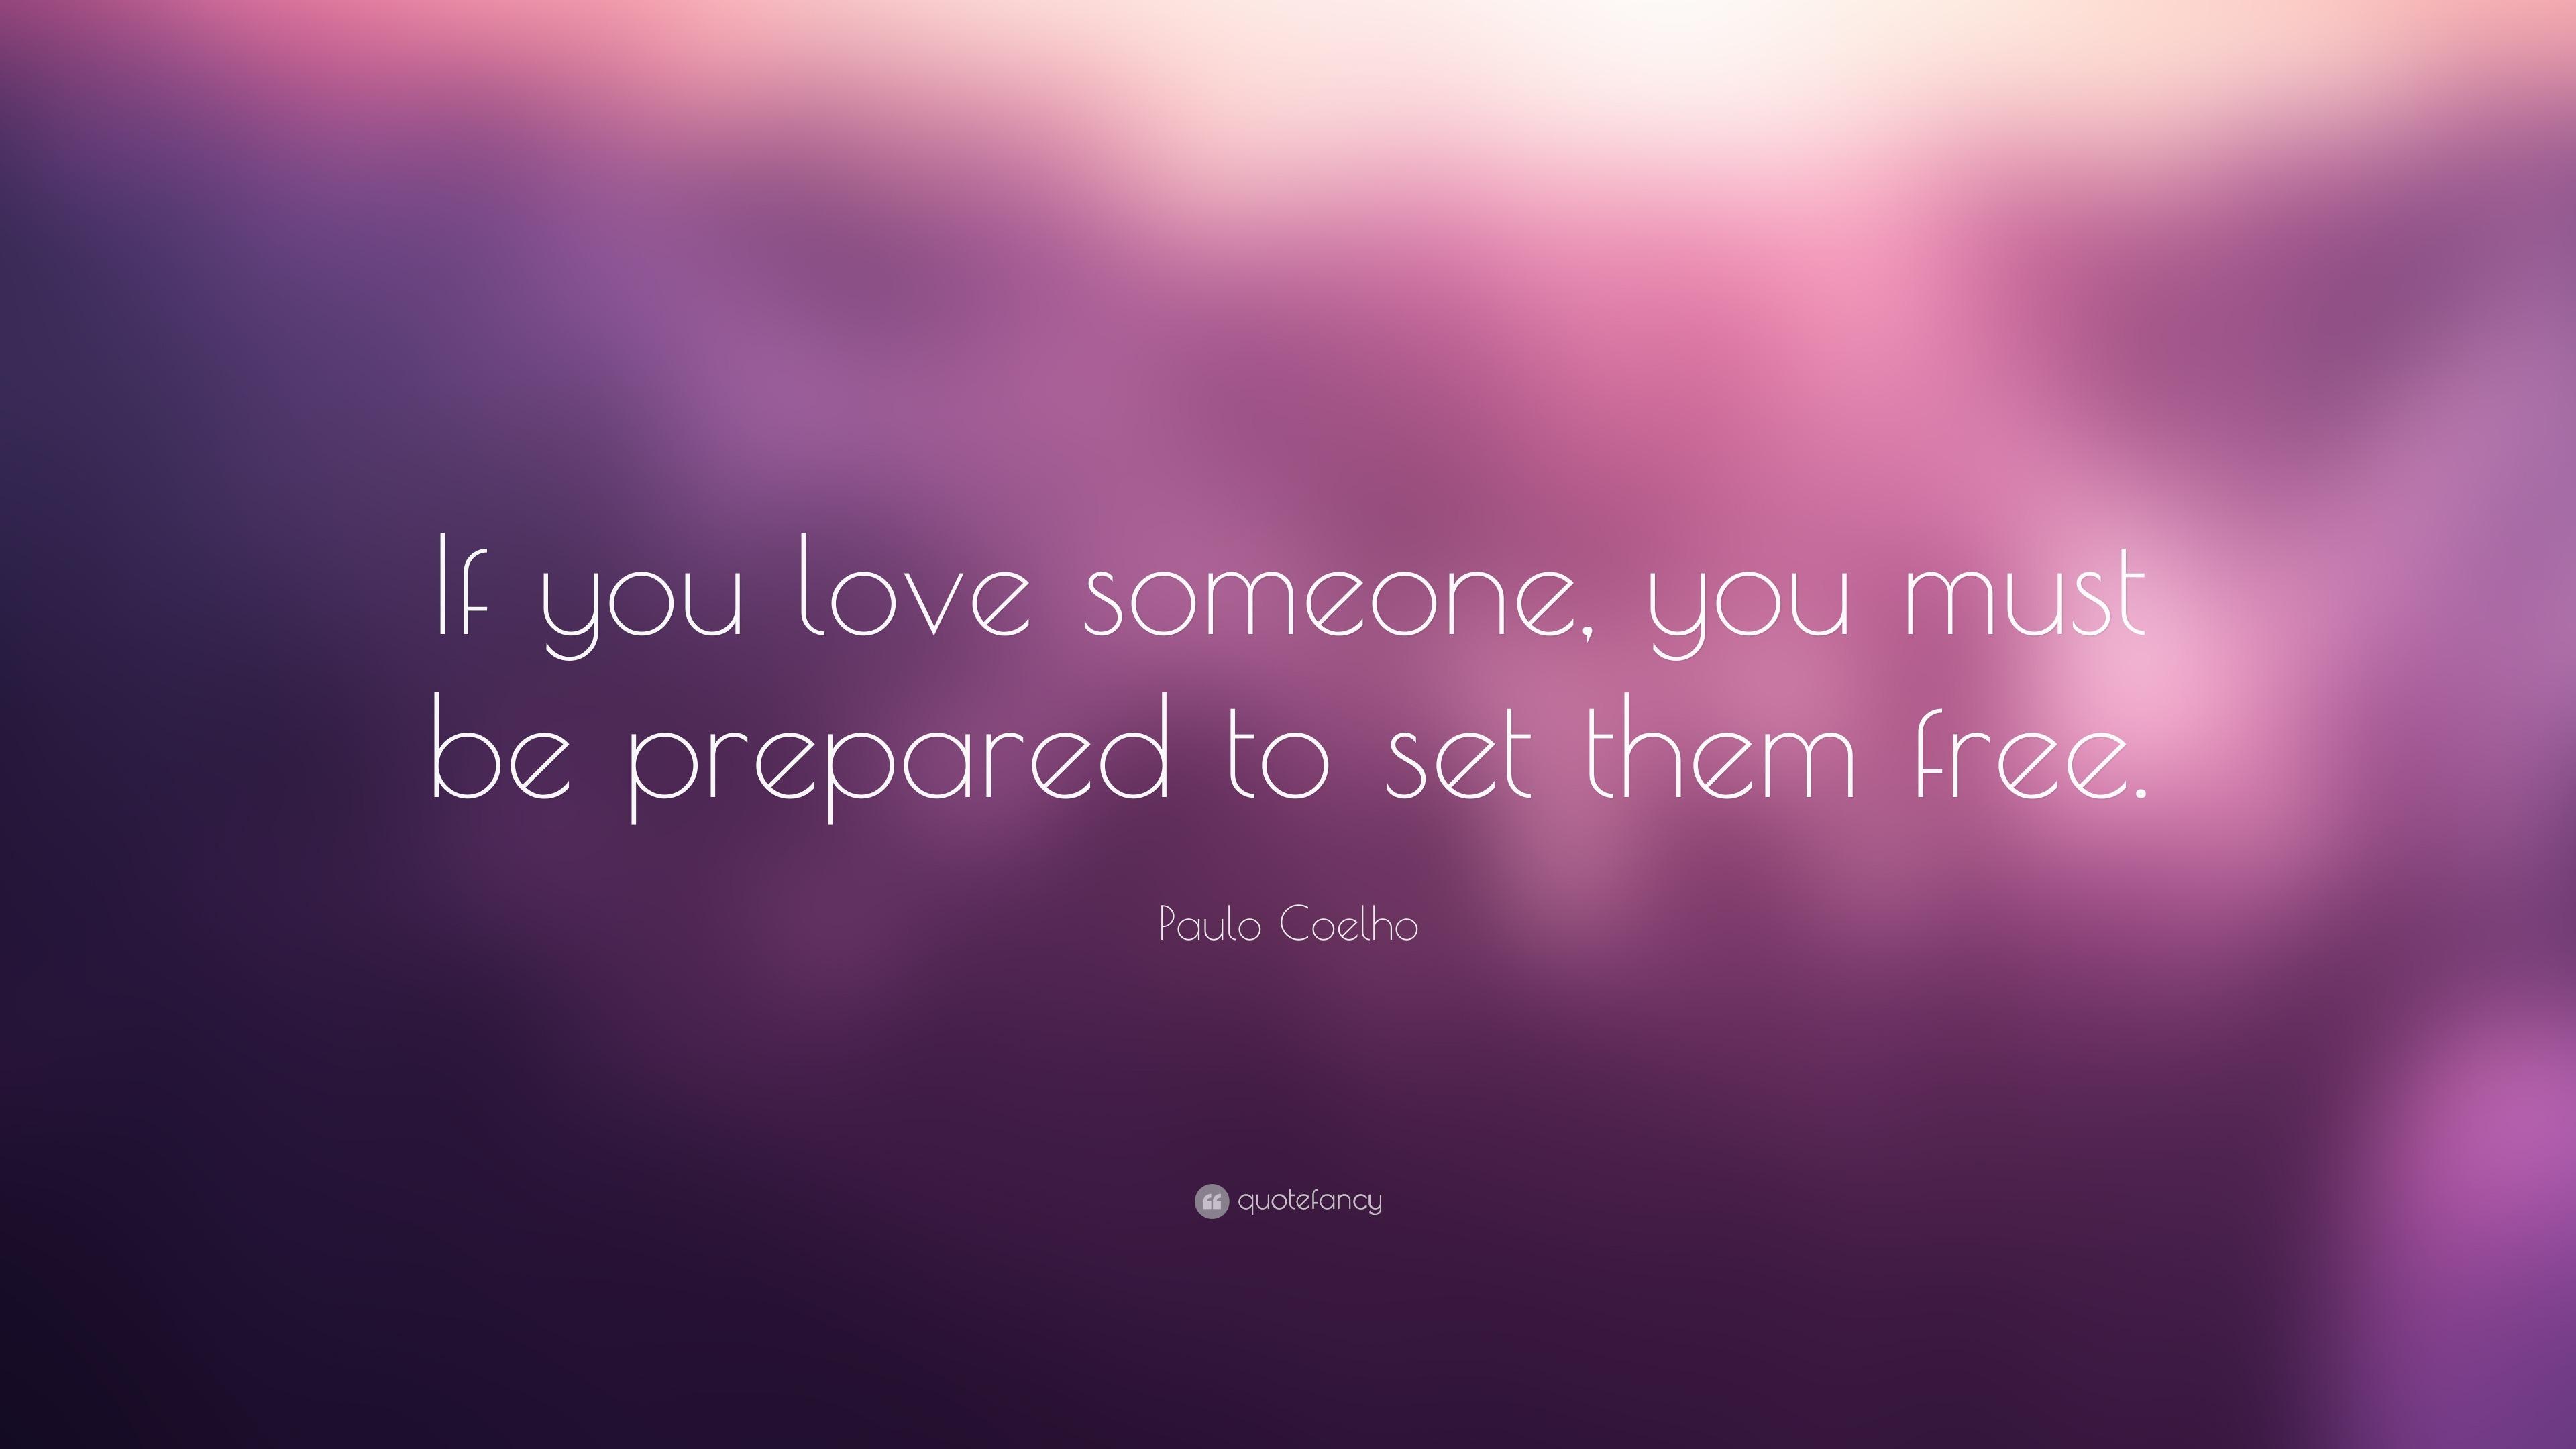 Paulo Coelho Quotes (100 Wallpapers)